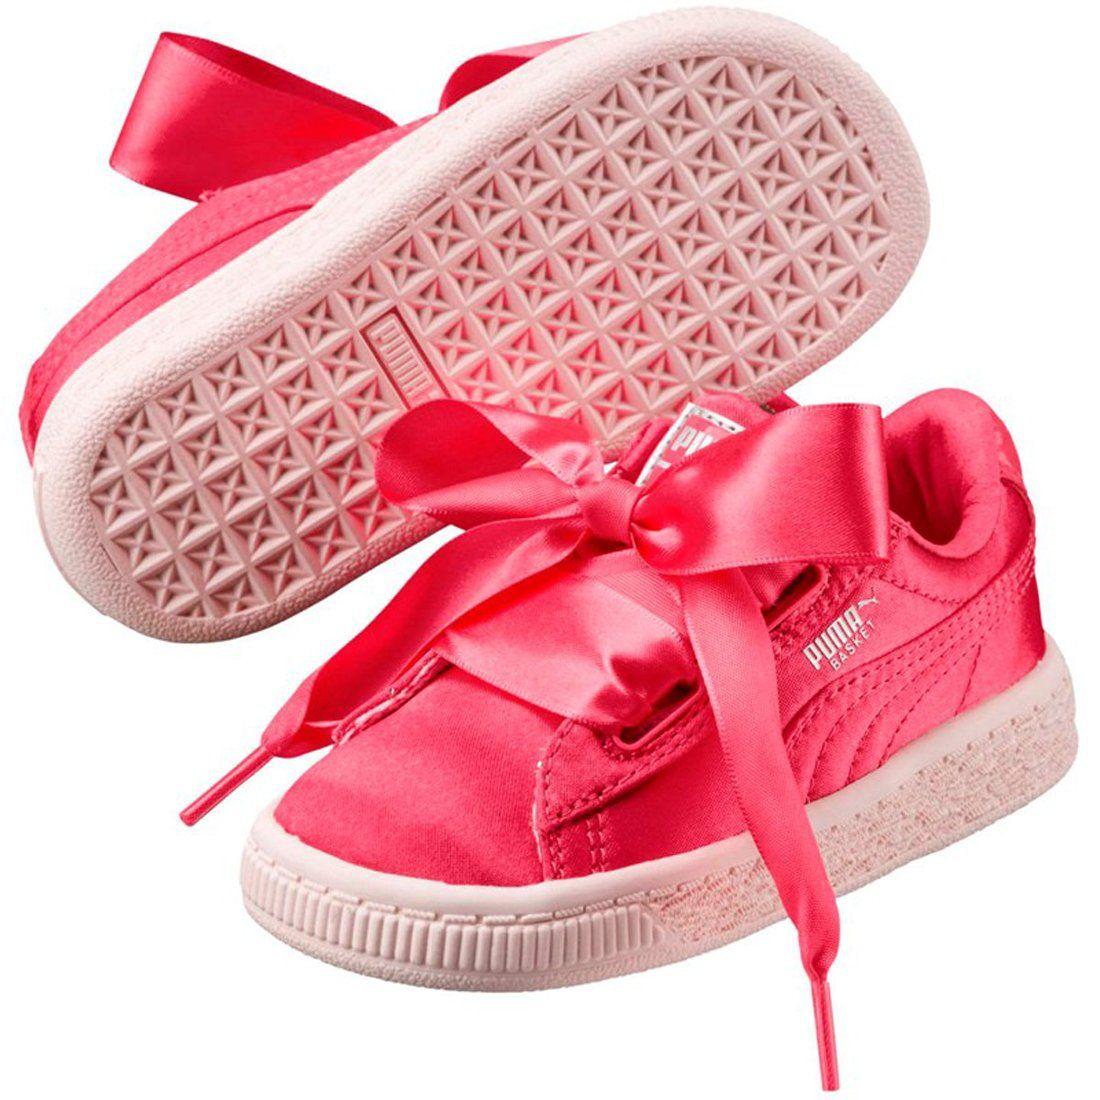 outlet store c6584 e1fcb PUMA Basket Heart Tween Kids | Paradise Pink / Paradise Pink ...